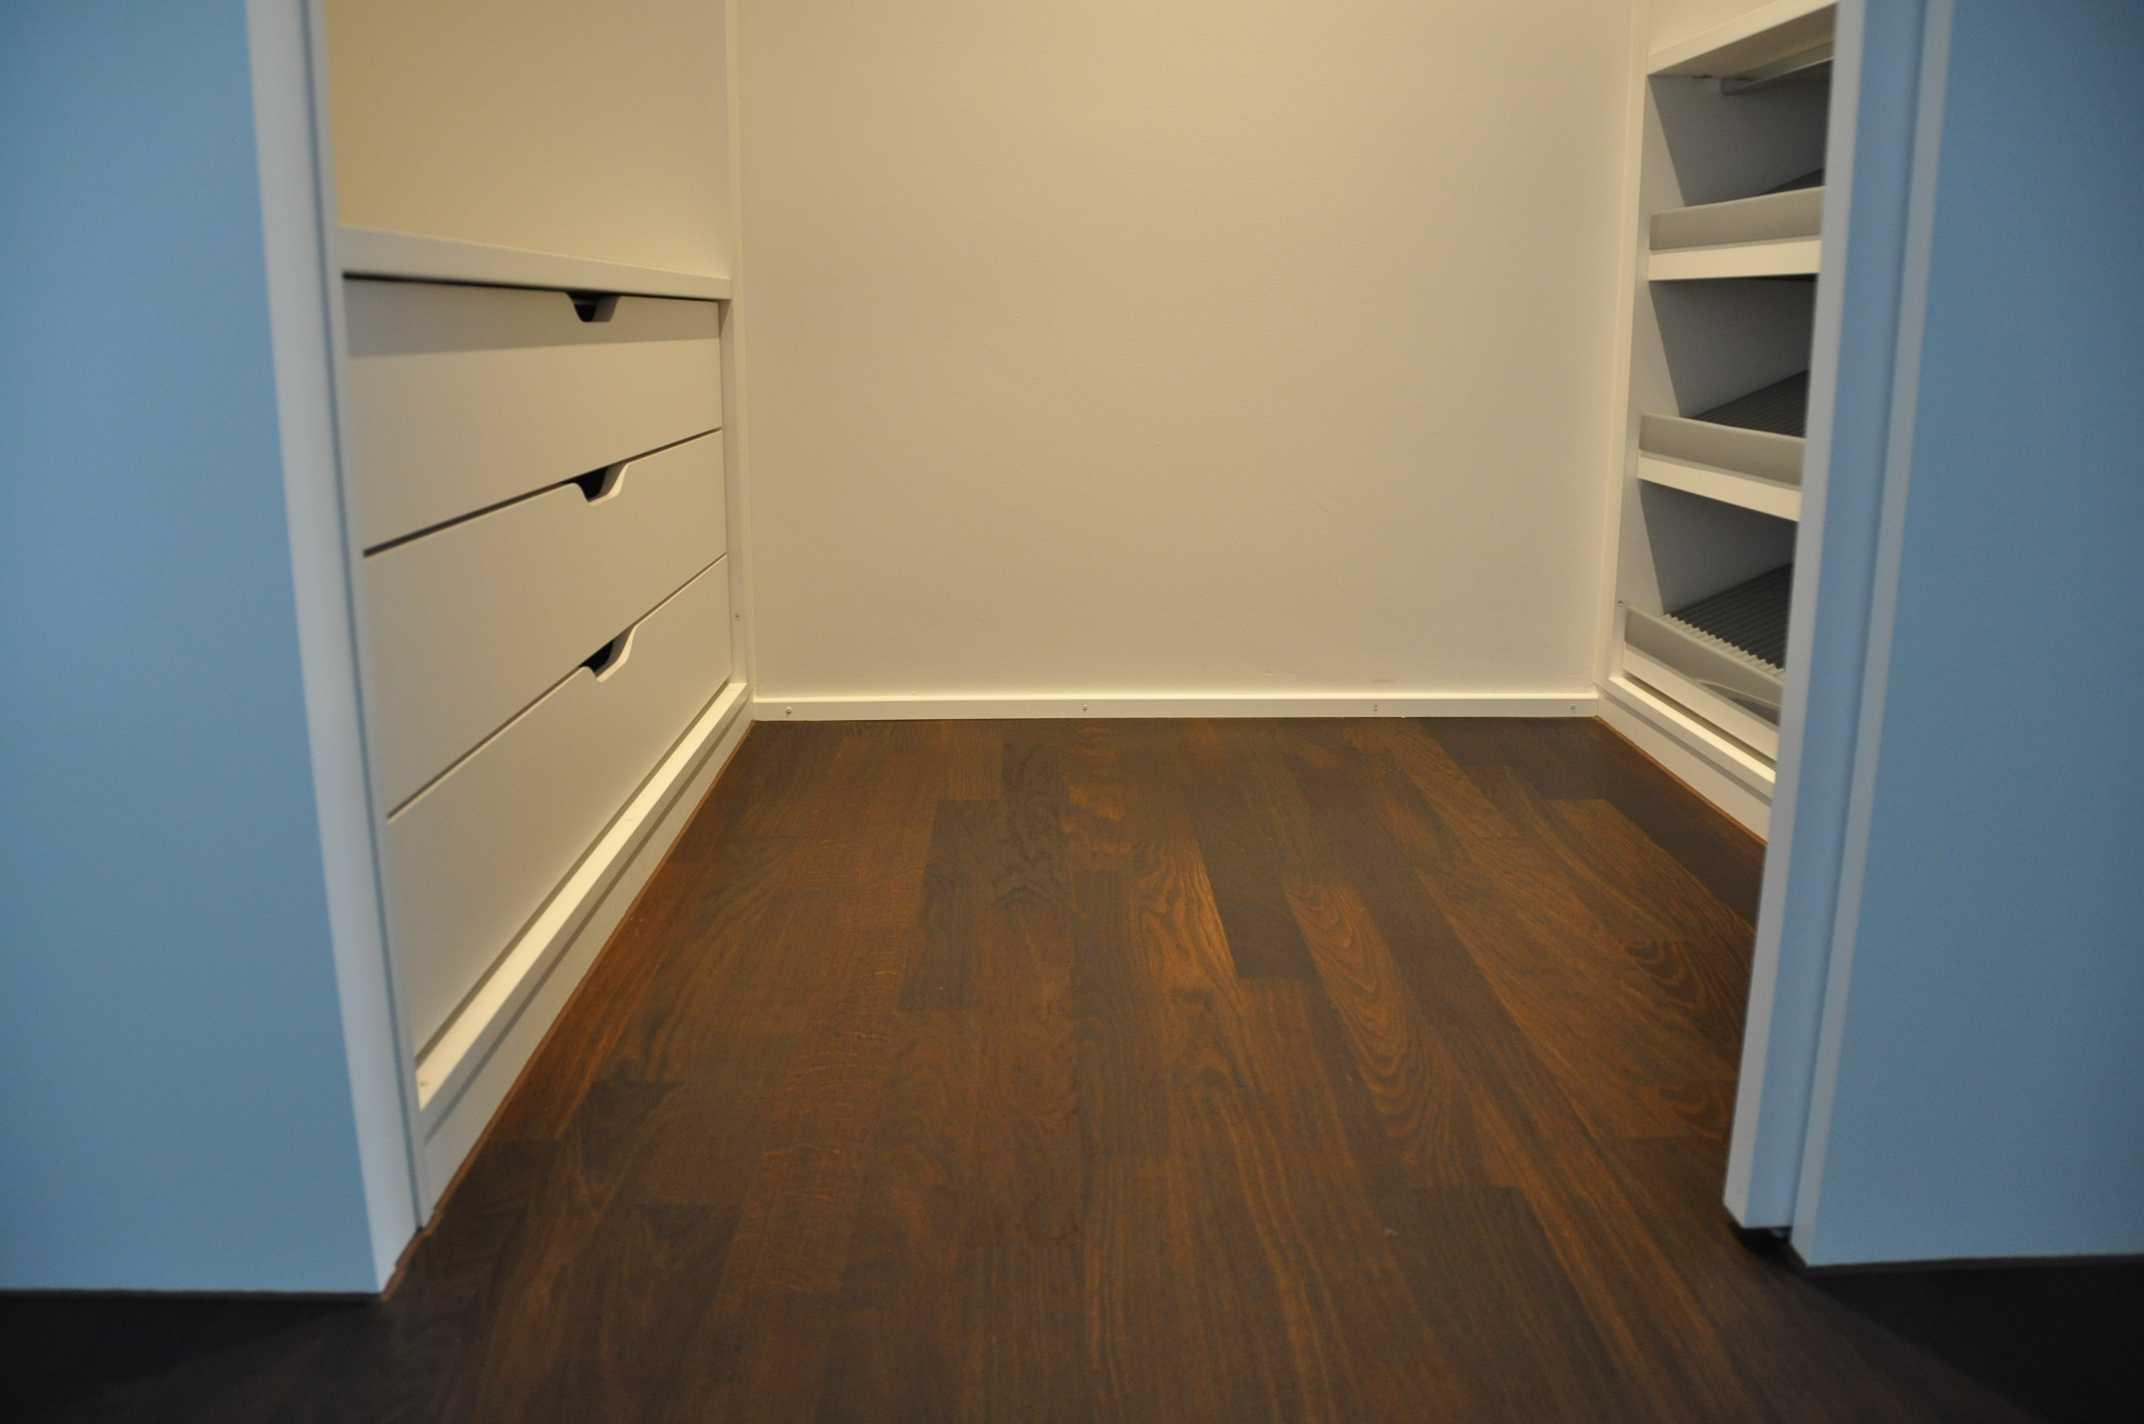 parkett eiche dunkel ref 1 archive leutenegger ag. Black Bedroom Furniture Sets. Home Design Ideas